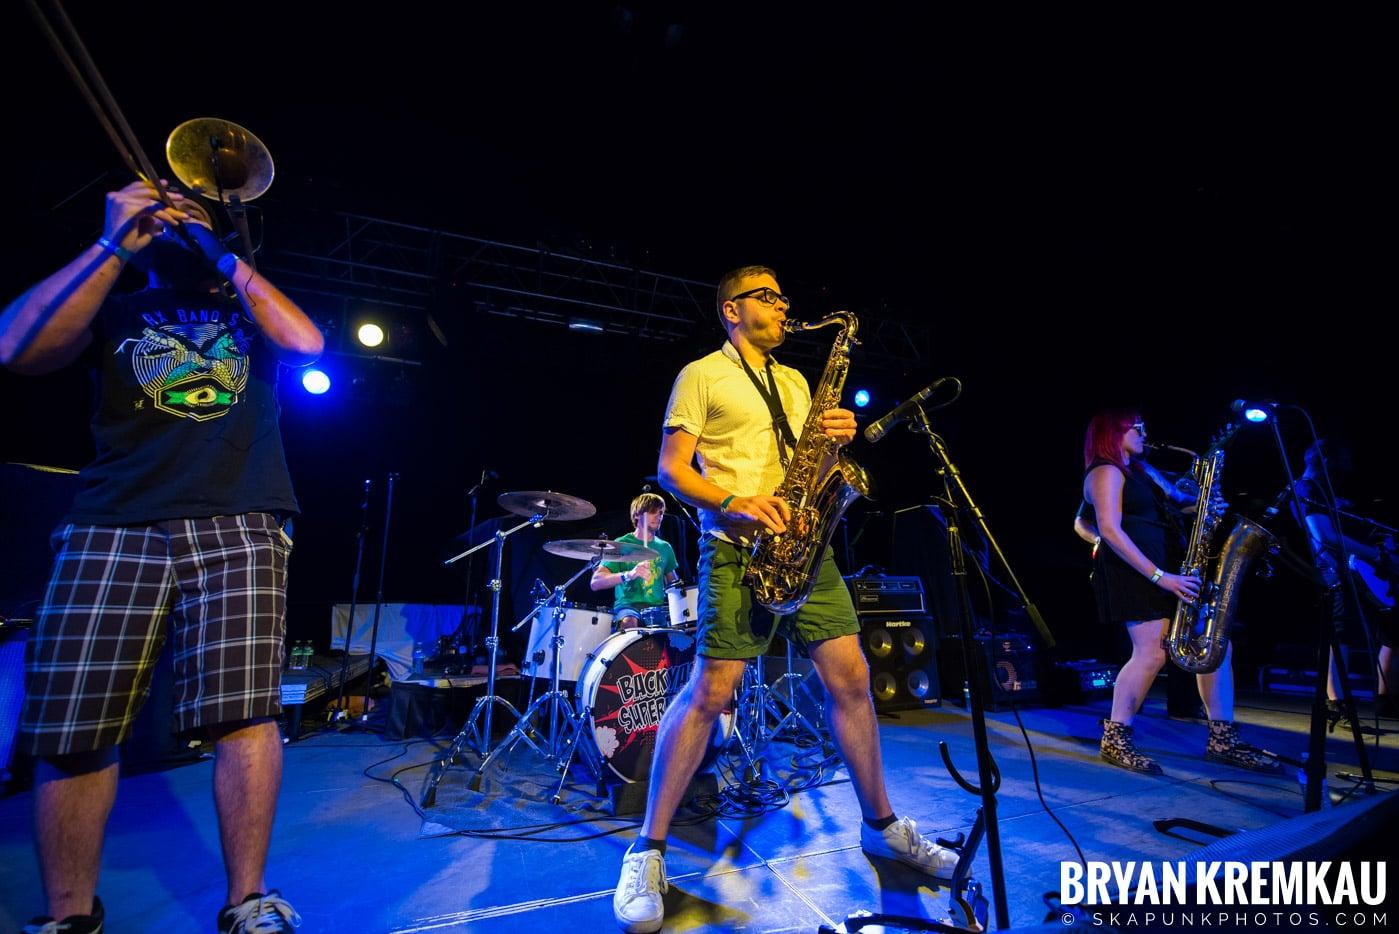 Backyard Superheroes @ Starland Ballroom, Sayreville, NJ - 7.29.17 (13)